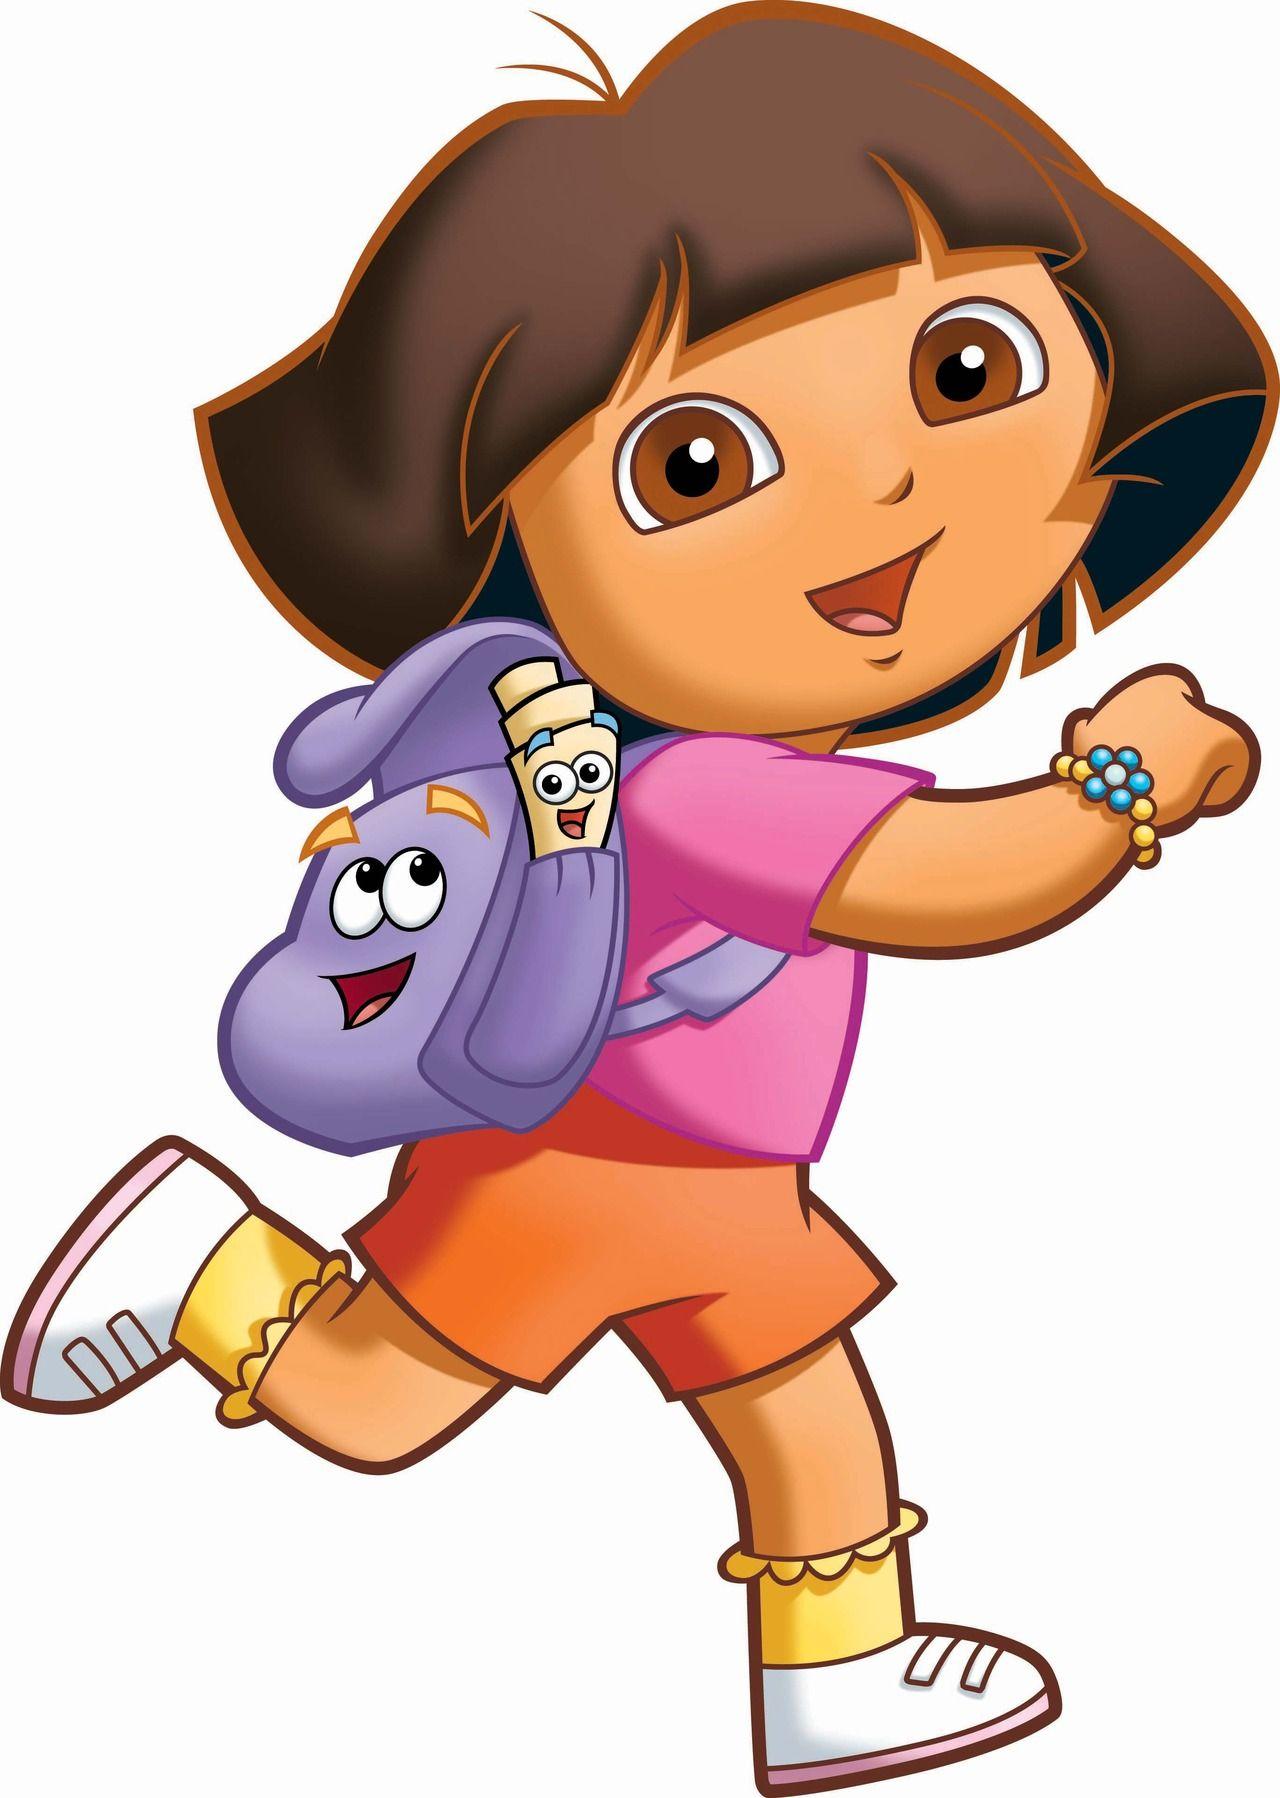 Dora. #Dora #Recamara #Cuarto #Decoracion #Colchas #Intima #Cobertor ...